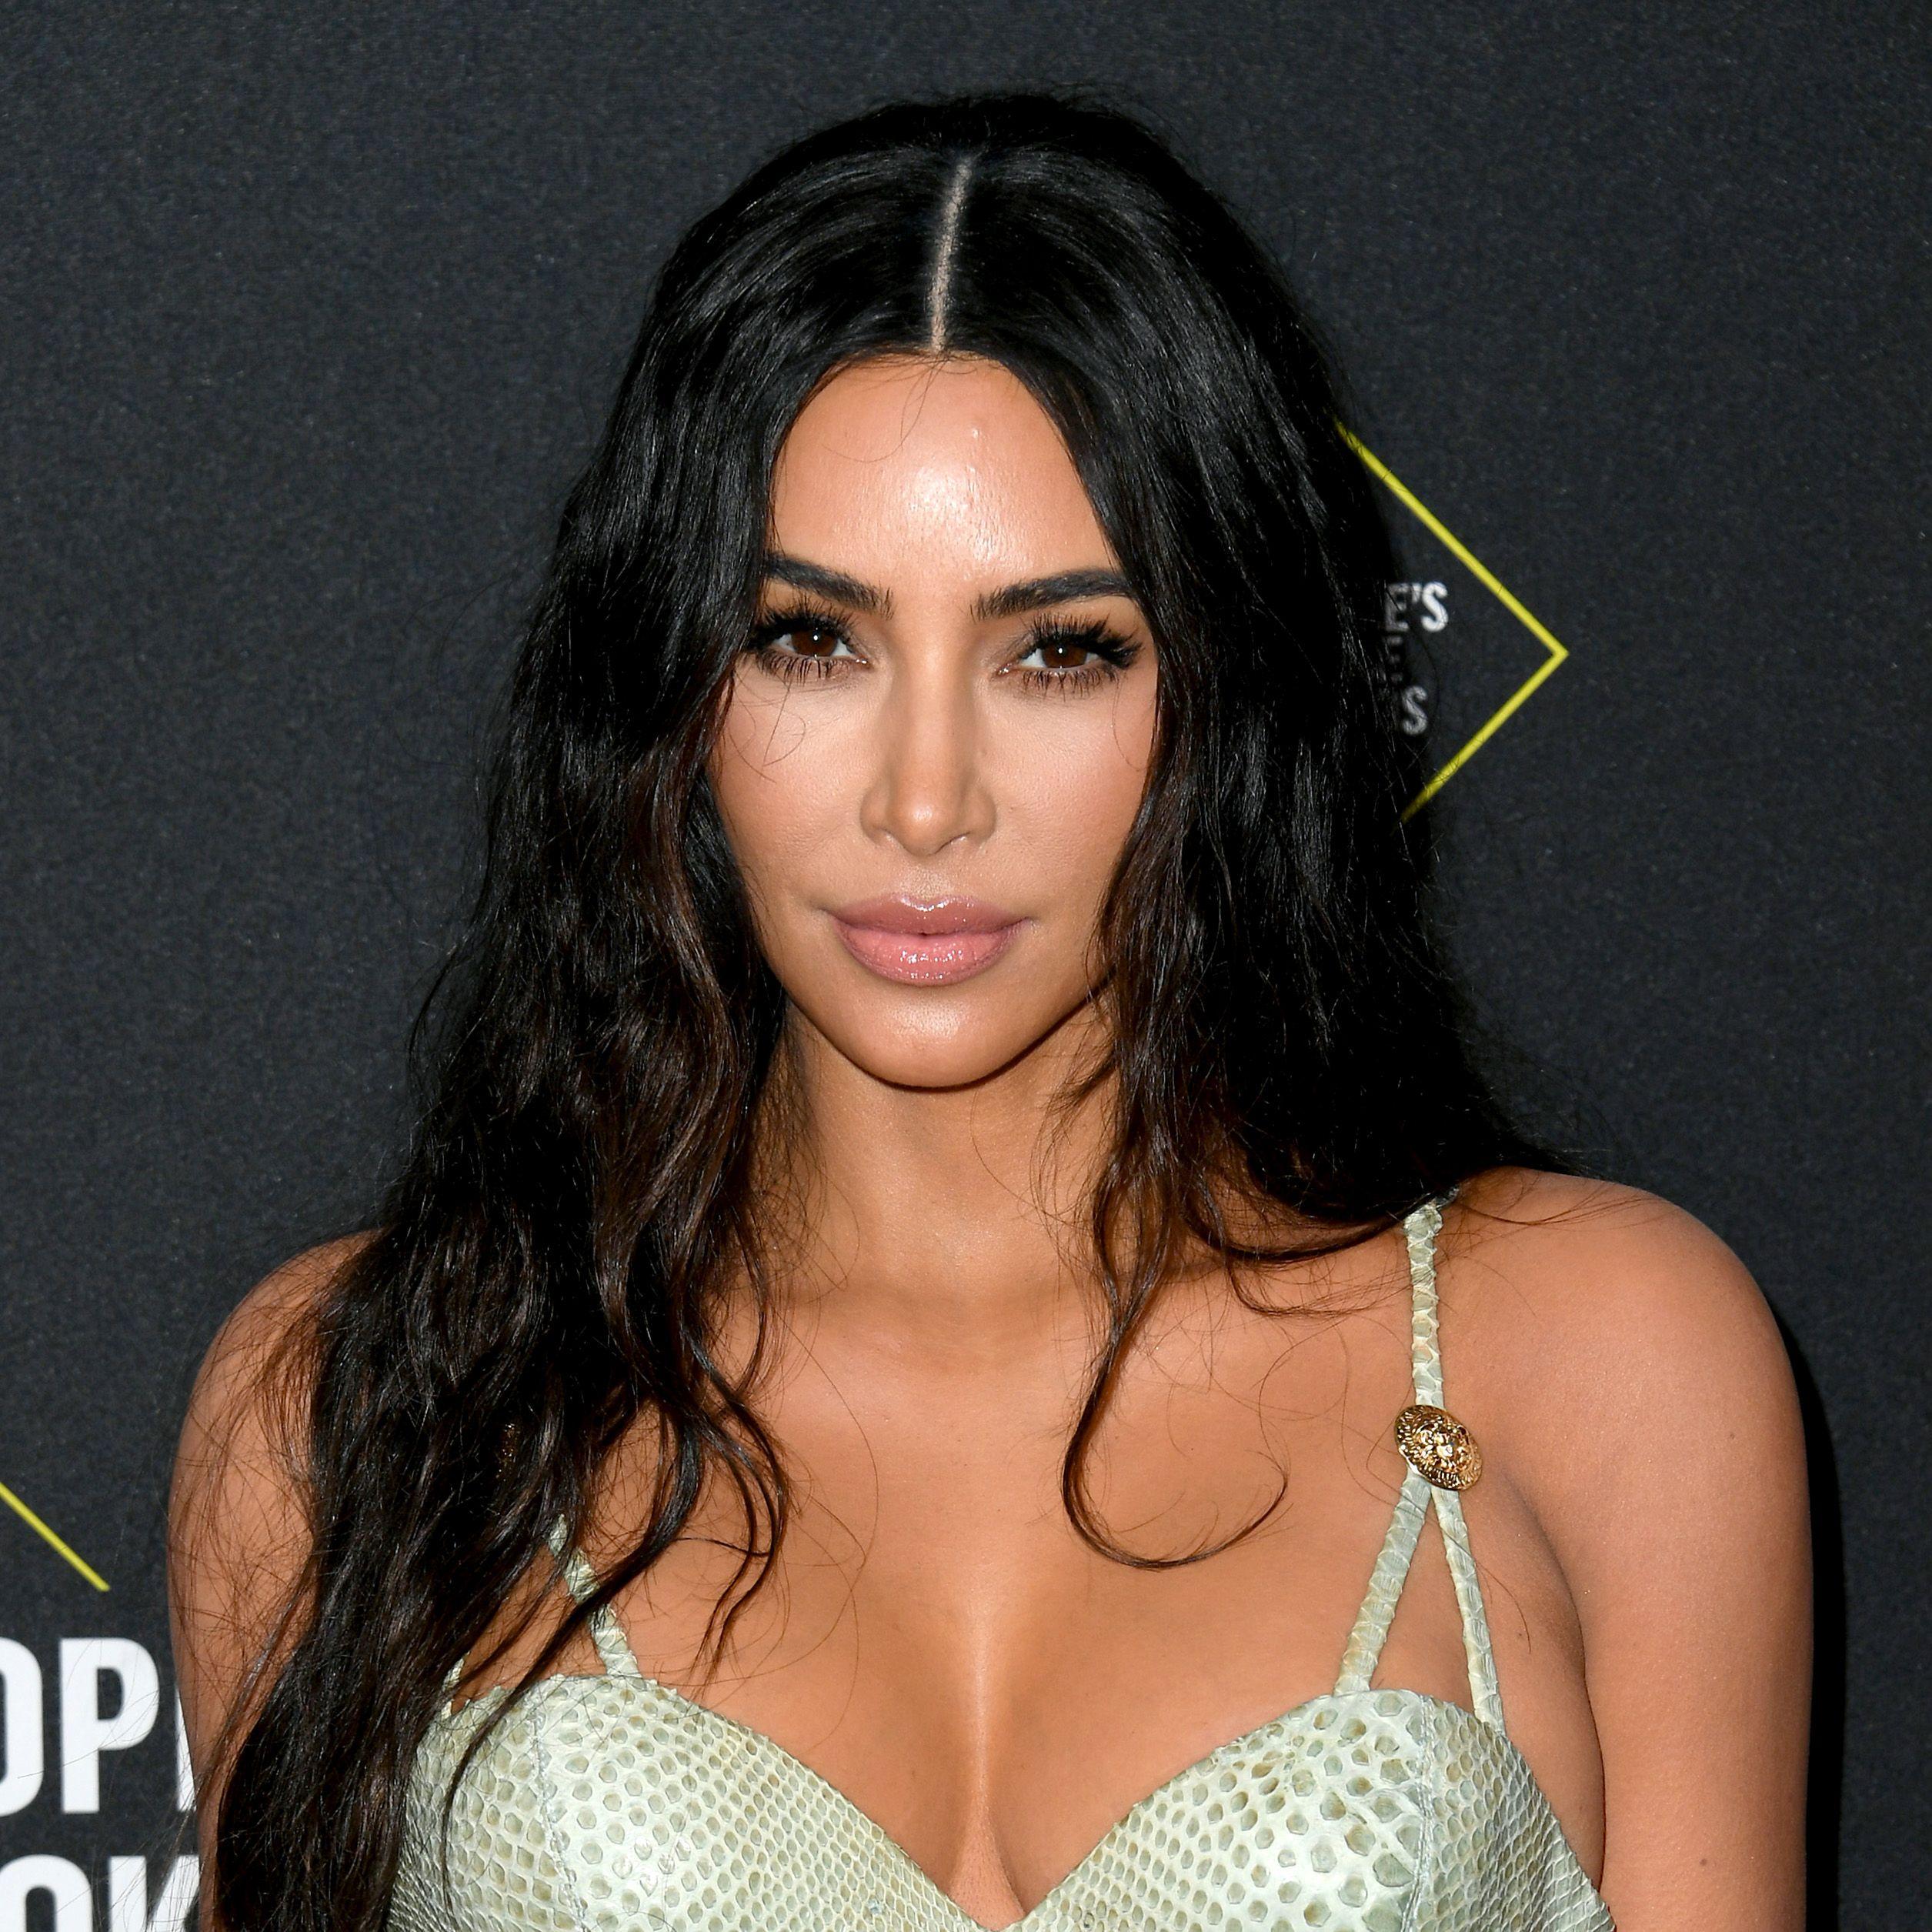 This is how Kim Kardashian covers her dark circles